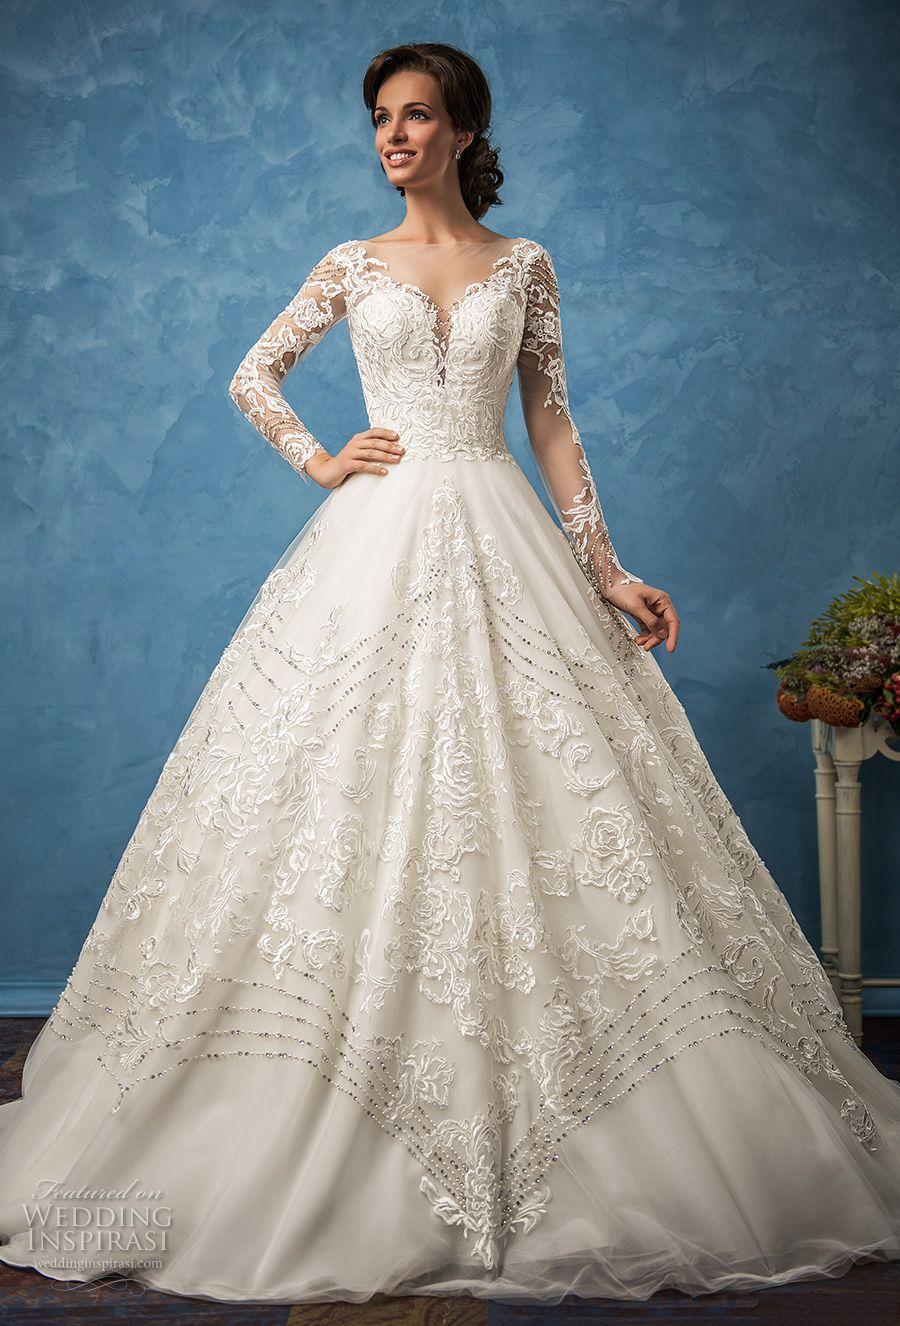 Long Sleeve Vintage Wedding Dresses 2017 Amelia Sposa Bridal Sweetheart Neckline Full